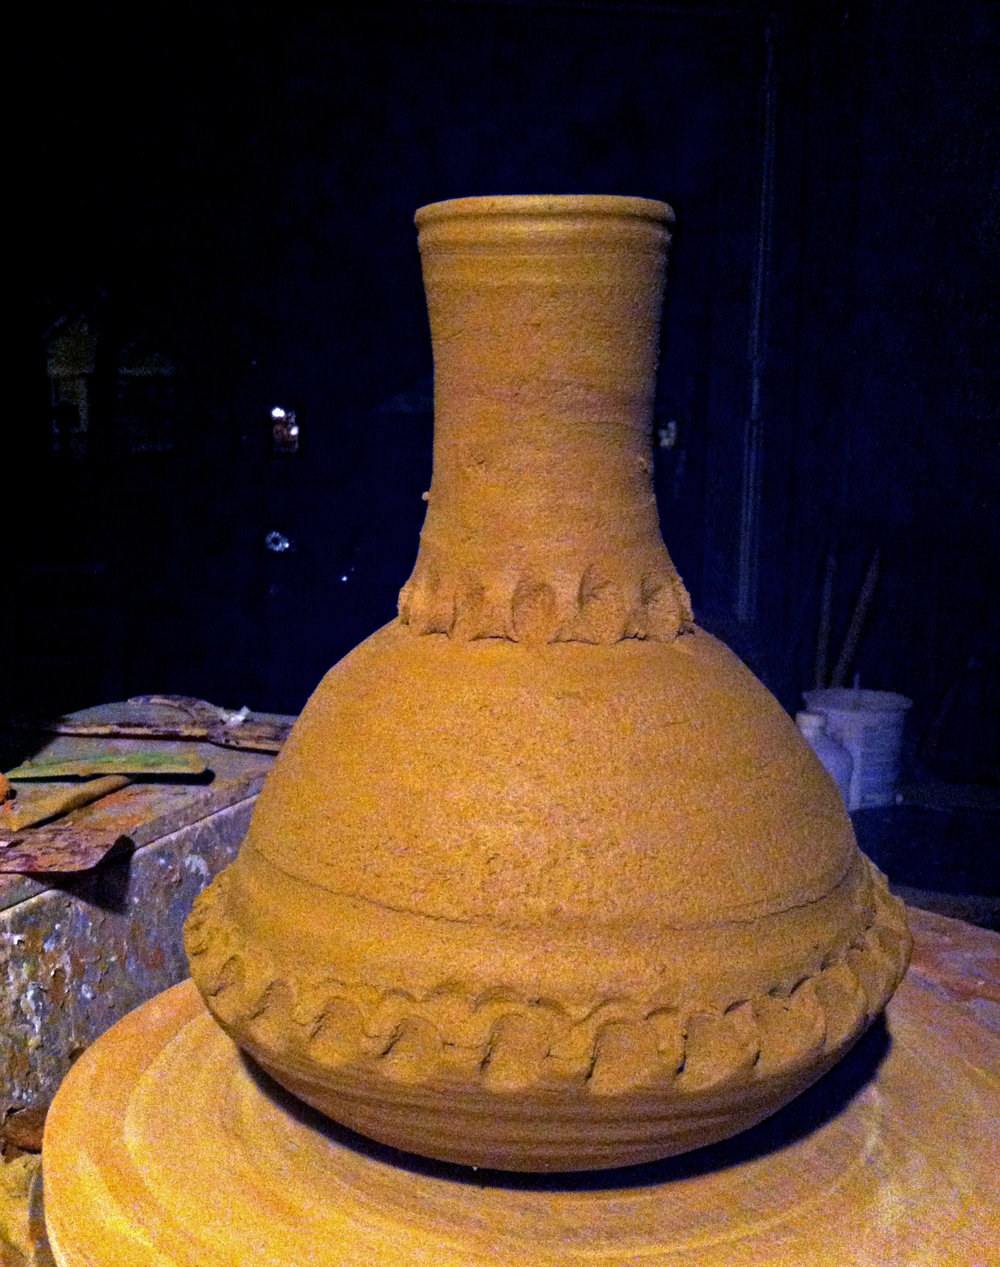 vase-on-wheel.jpg